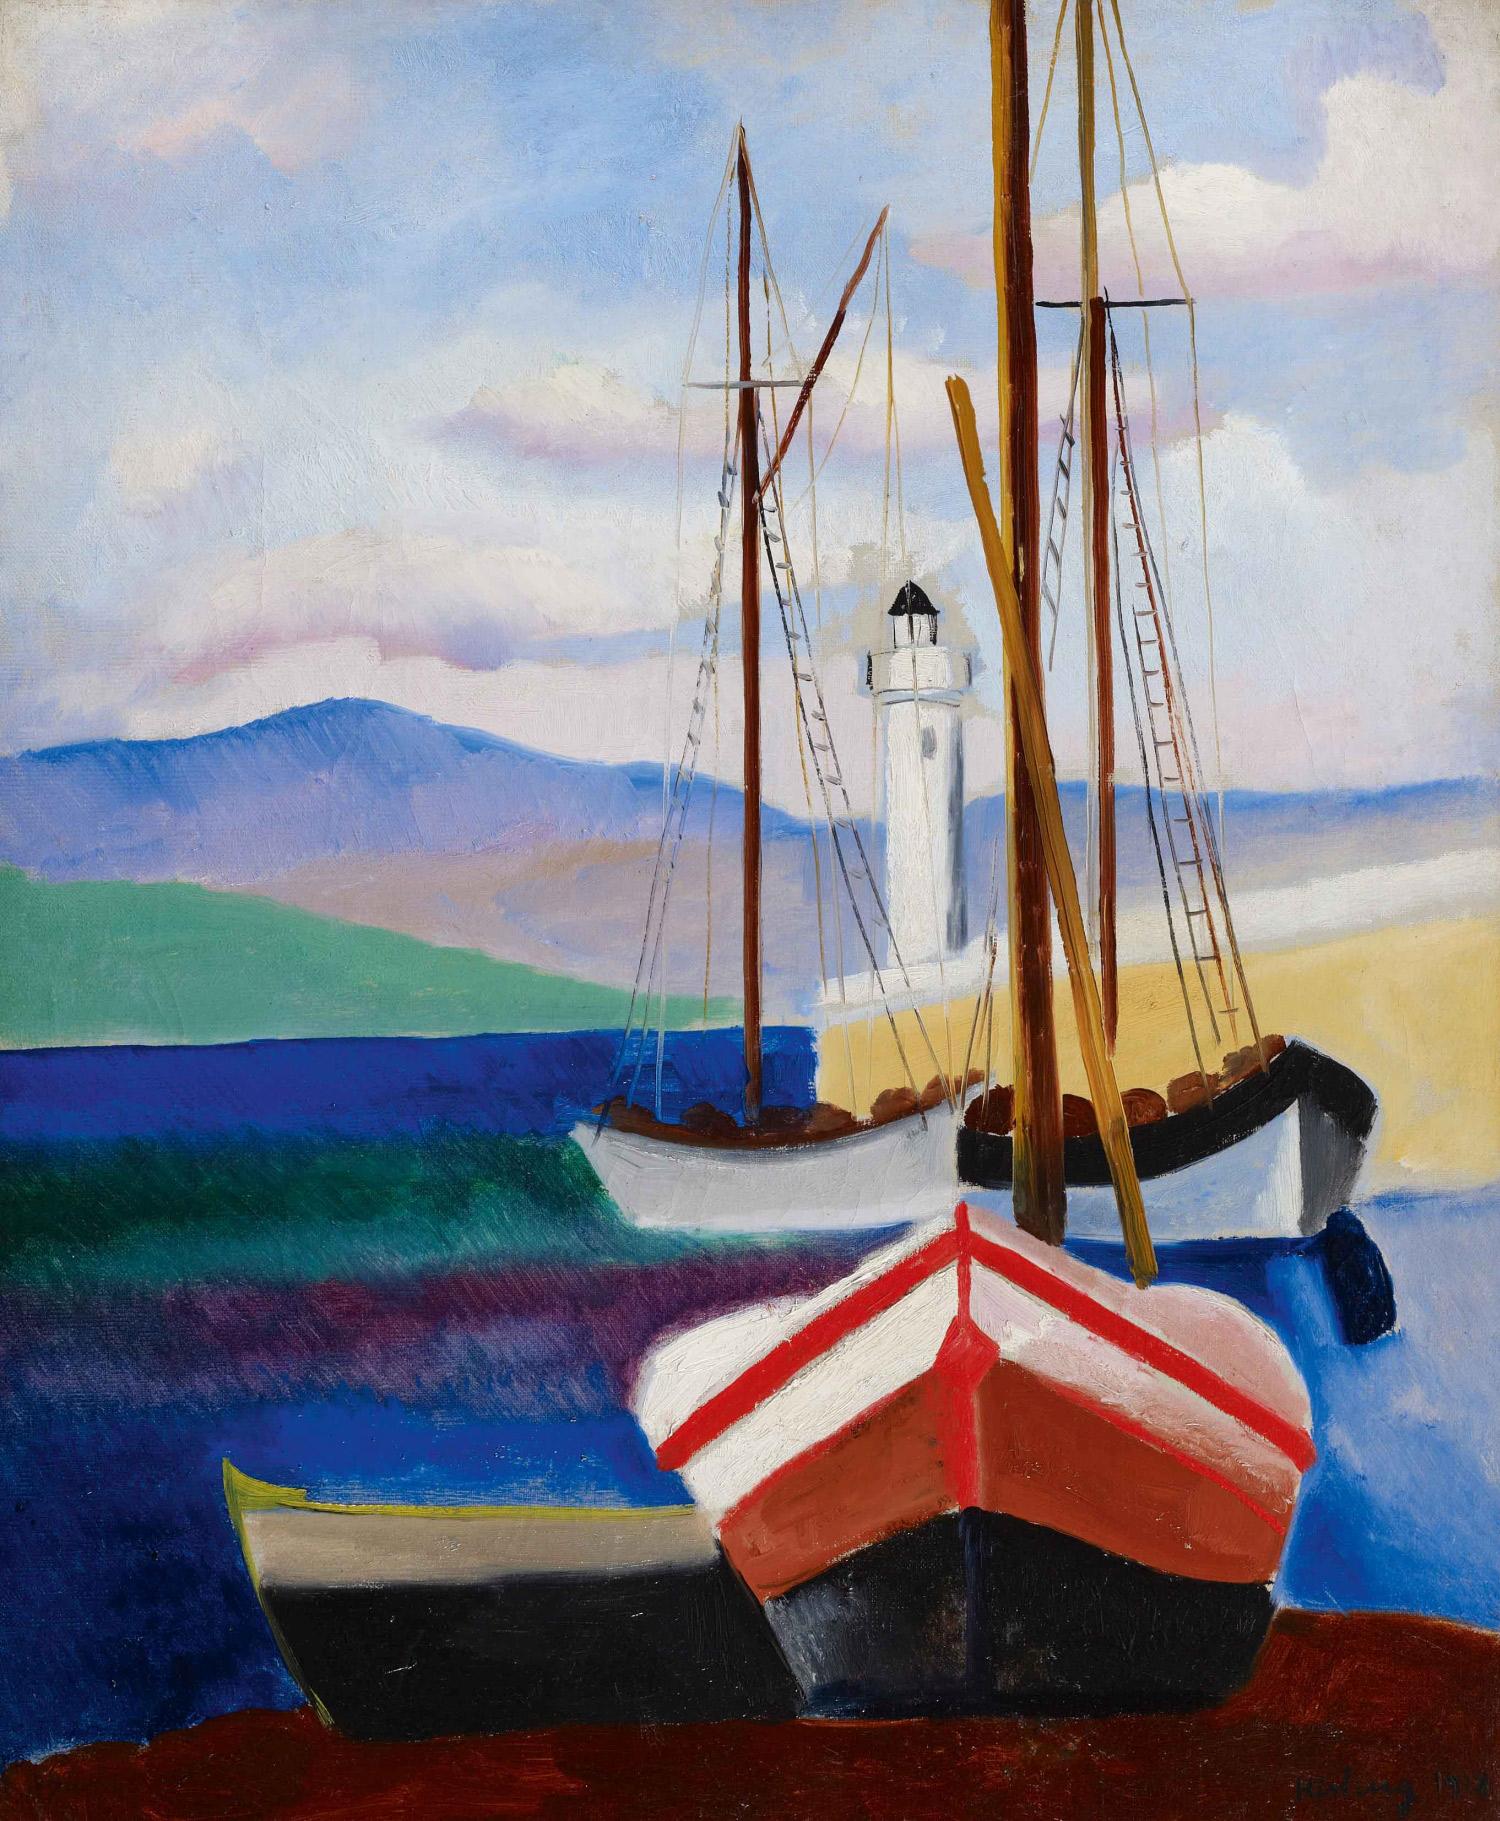 Moïse Kisling, St-Tropez, Septembre (1918; olio su tela, 65,2 x 54,2 cm; Collezione Jonas Netter)